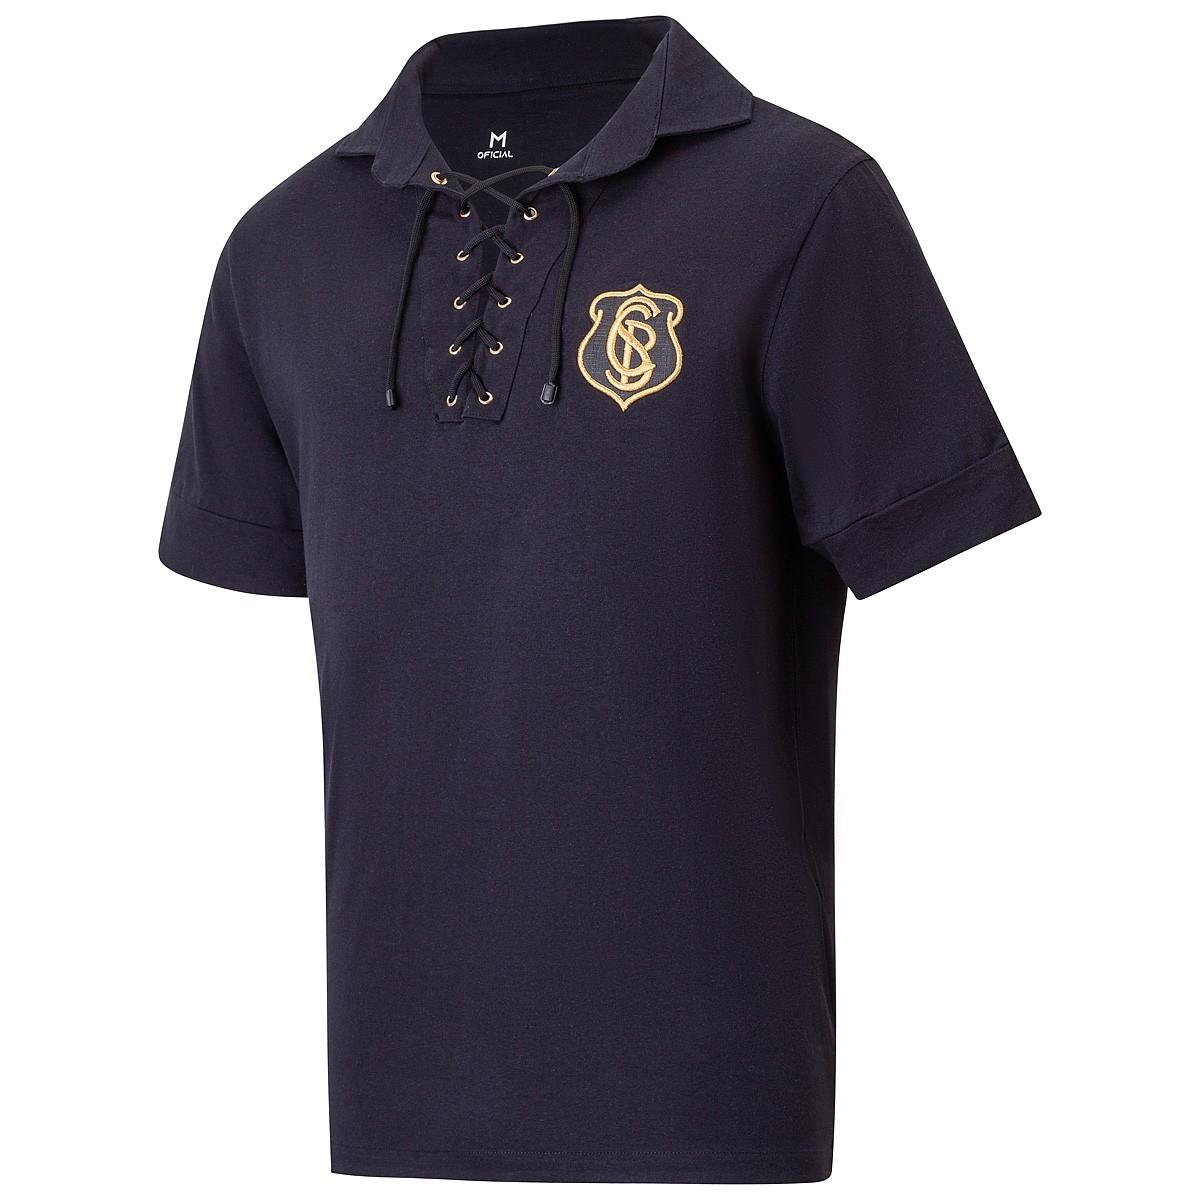 Camisa Corinthians Retrô Neco 1916 Masculina